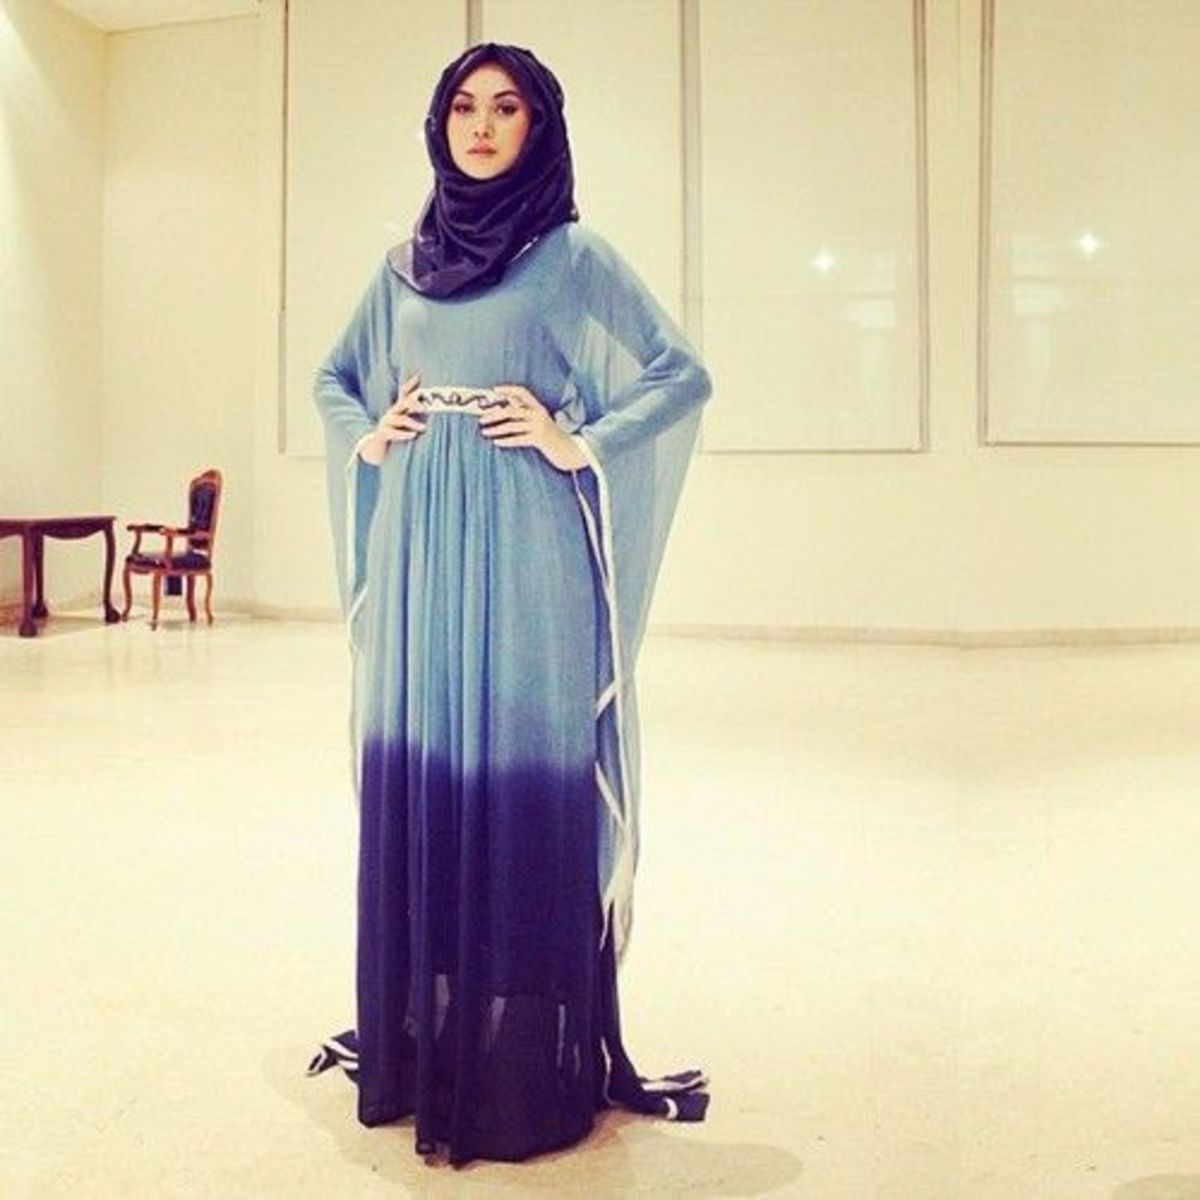 Kaftan style abaya in light blue and dark blue shade